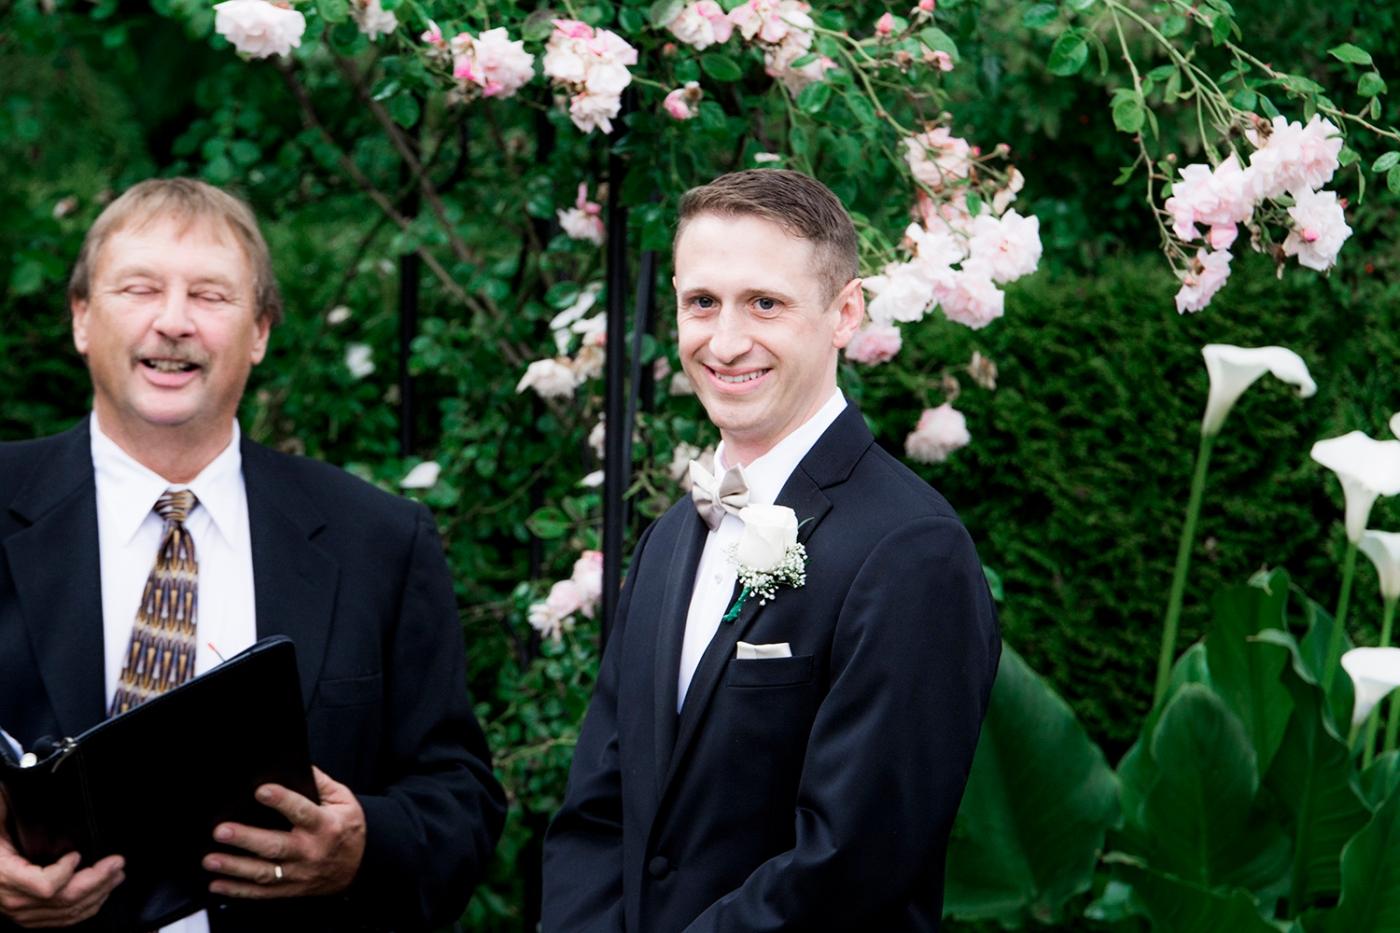 Jane_Speleers_2016_Details_Wedding_Wild_Rose_Estates_Venue_JS7_7717